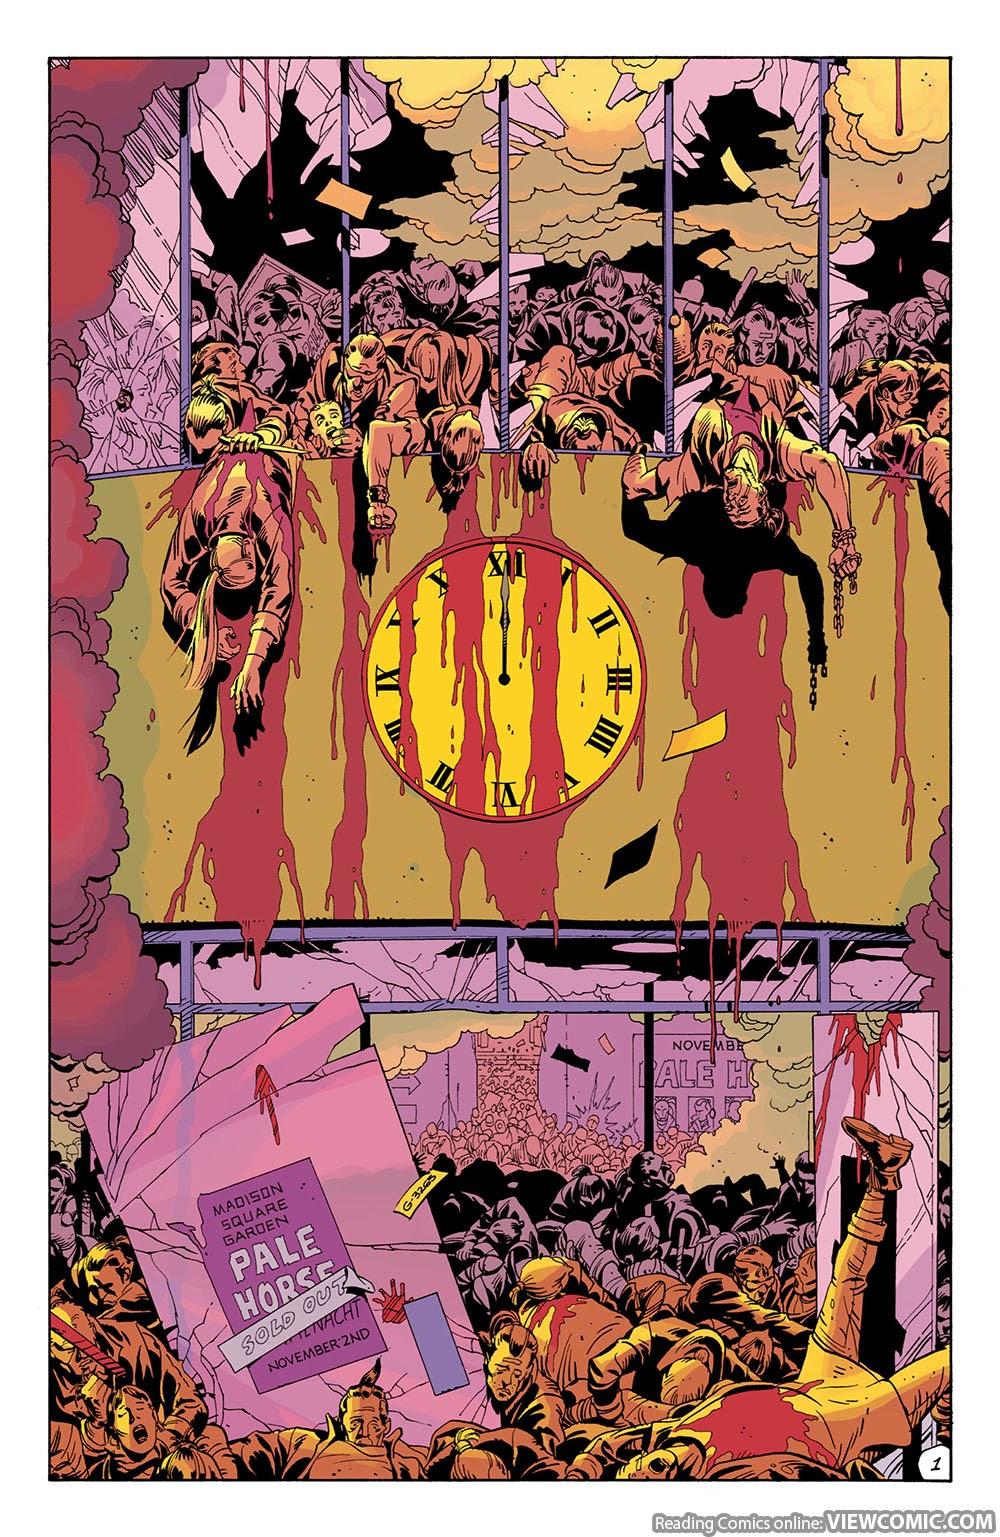 watchmen 12 viewcomic reading comics online for